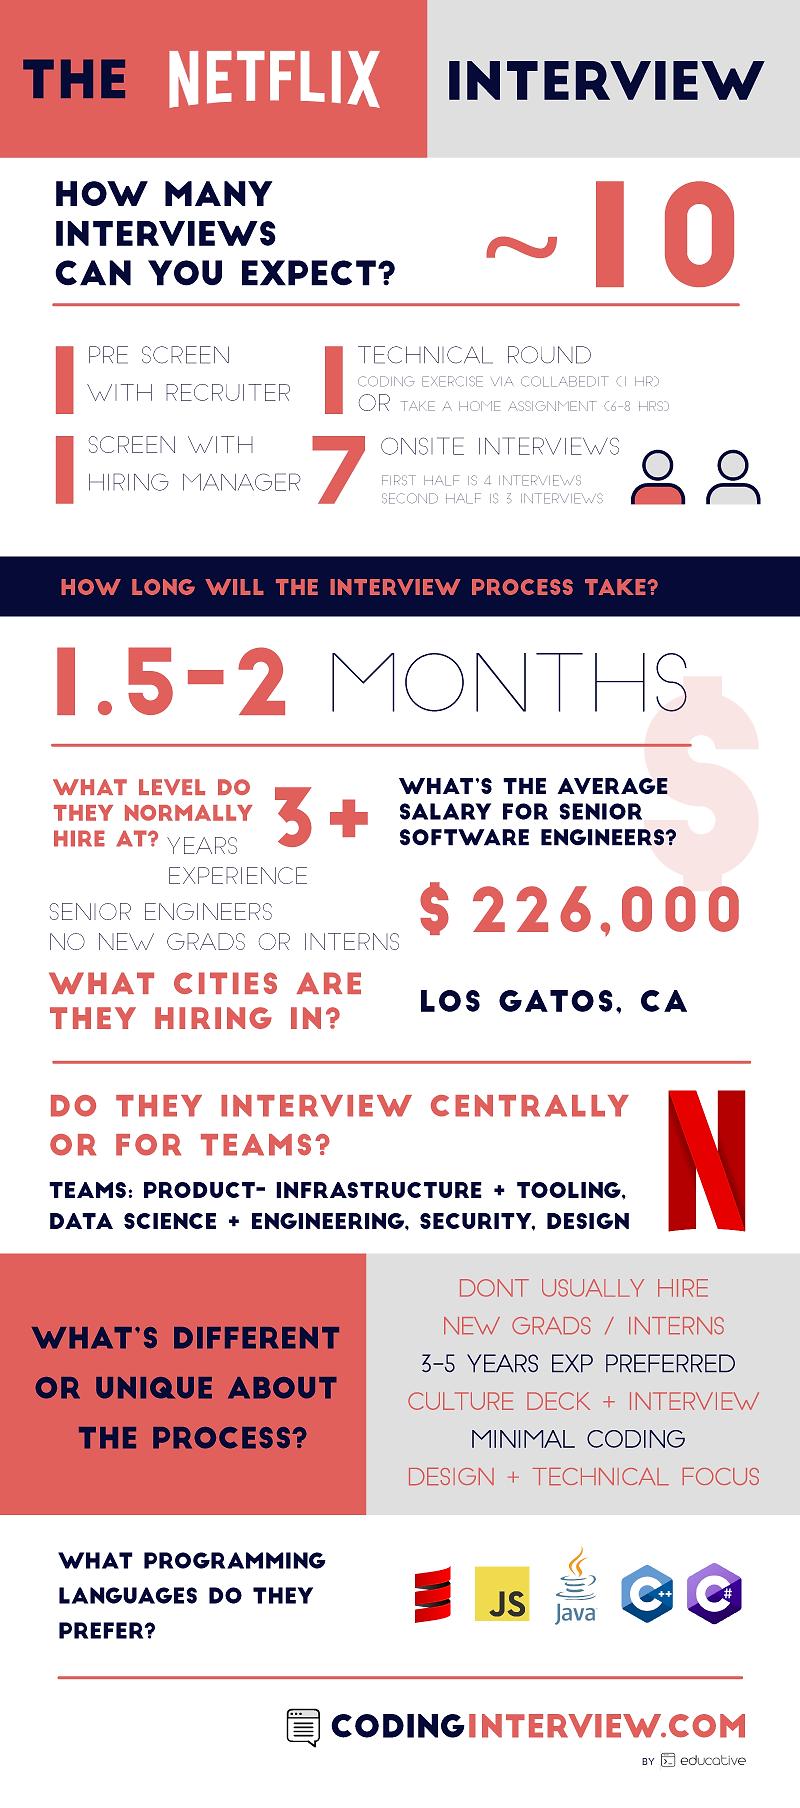 codinginterview_NETFLIX_infographic.png